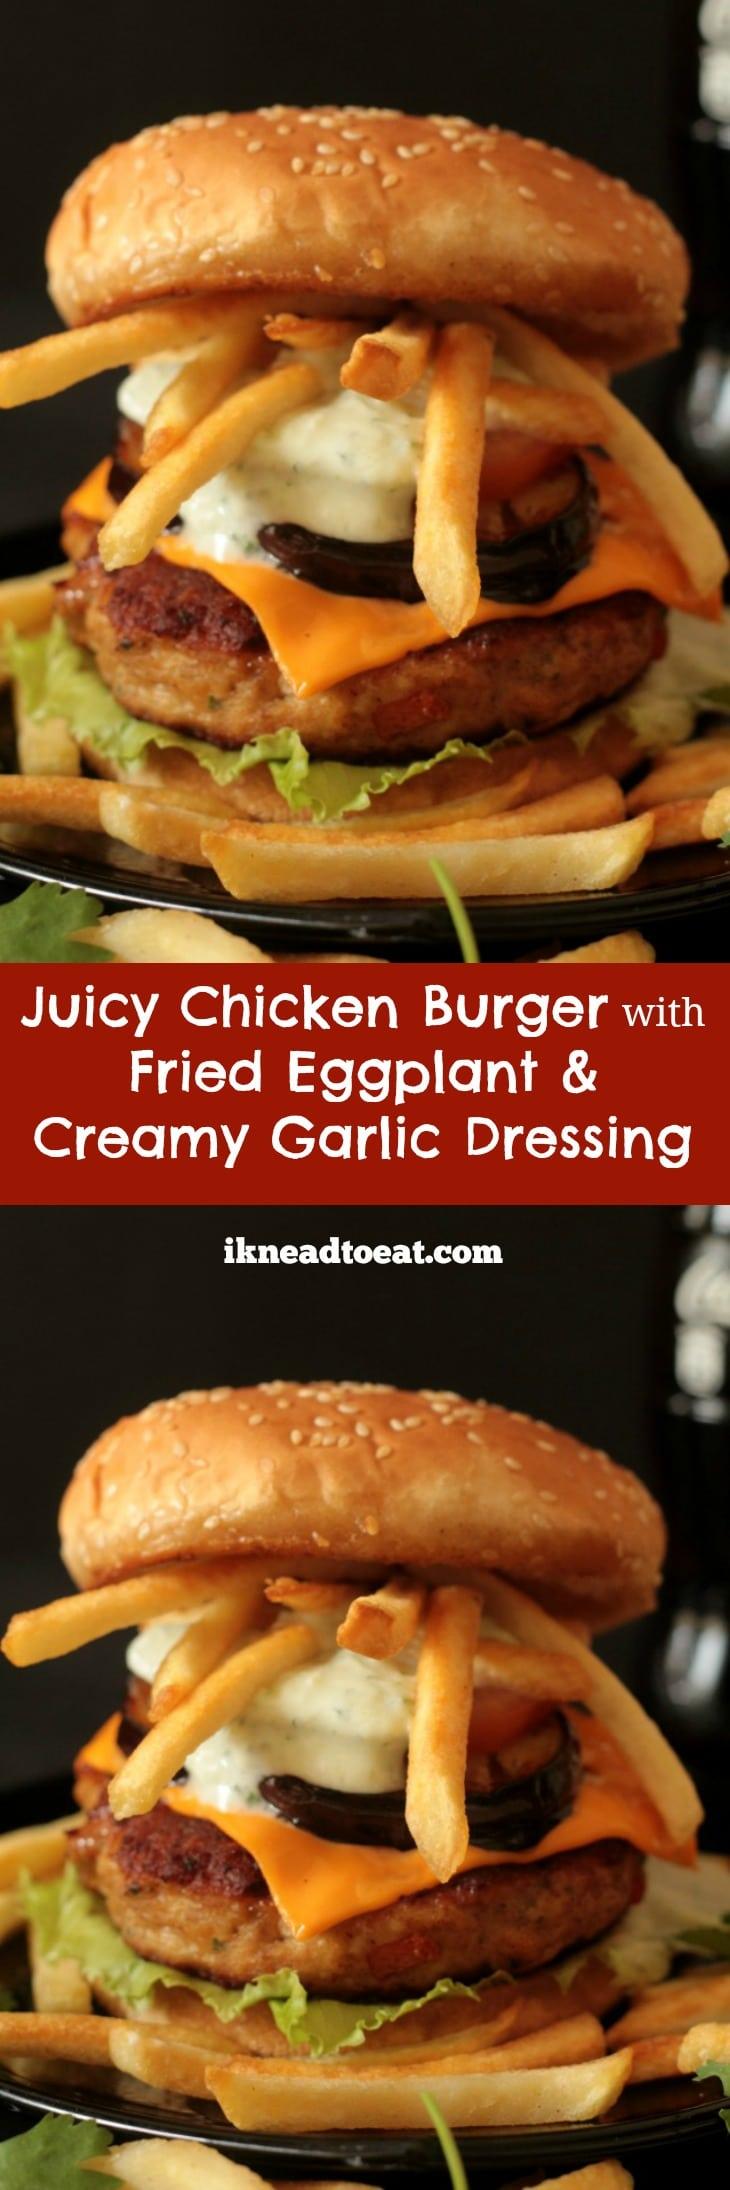 Juicy Chicken Burger with Fried Eggplant & Creamy Garlic Dressing